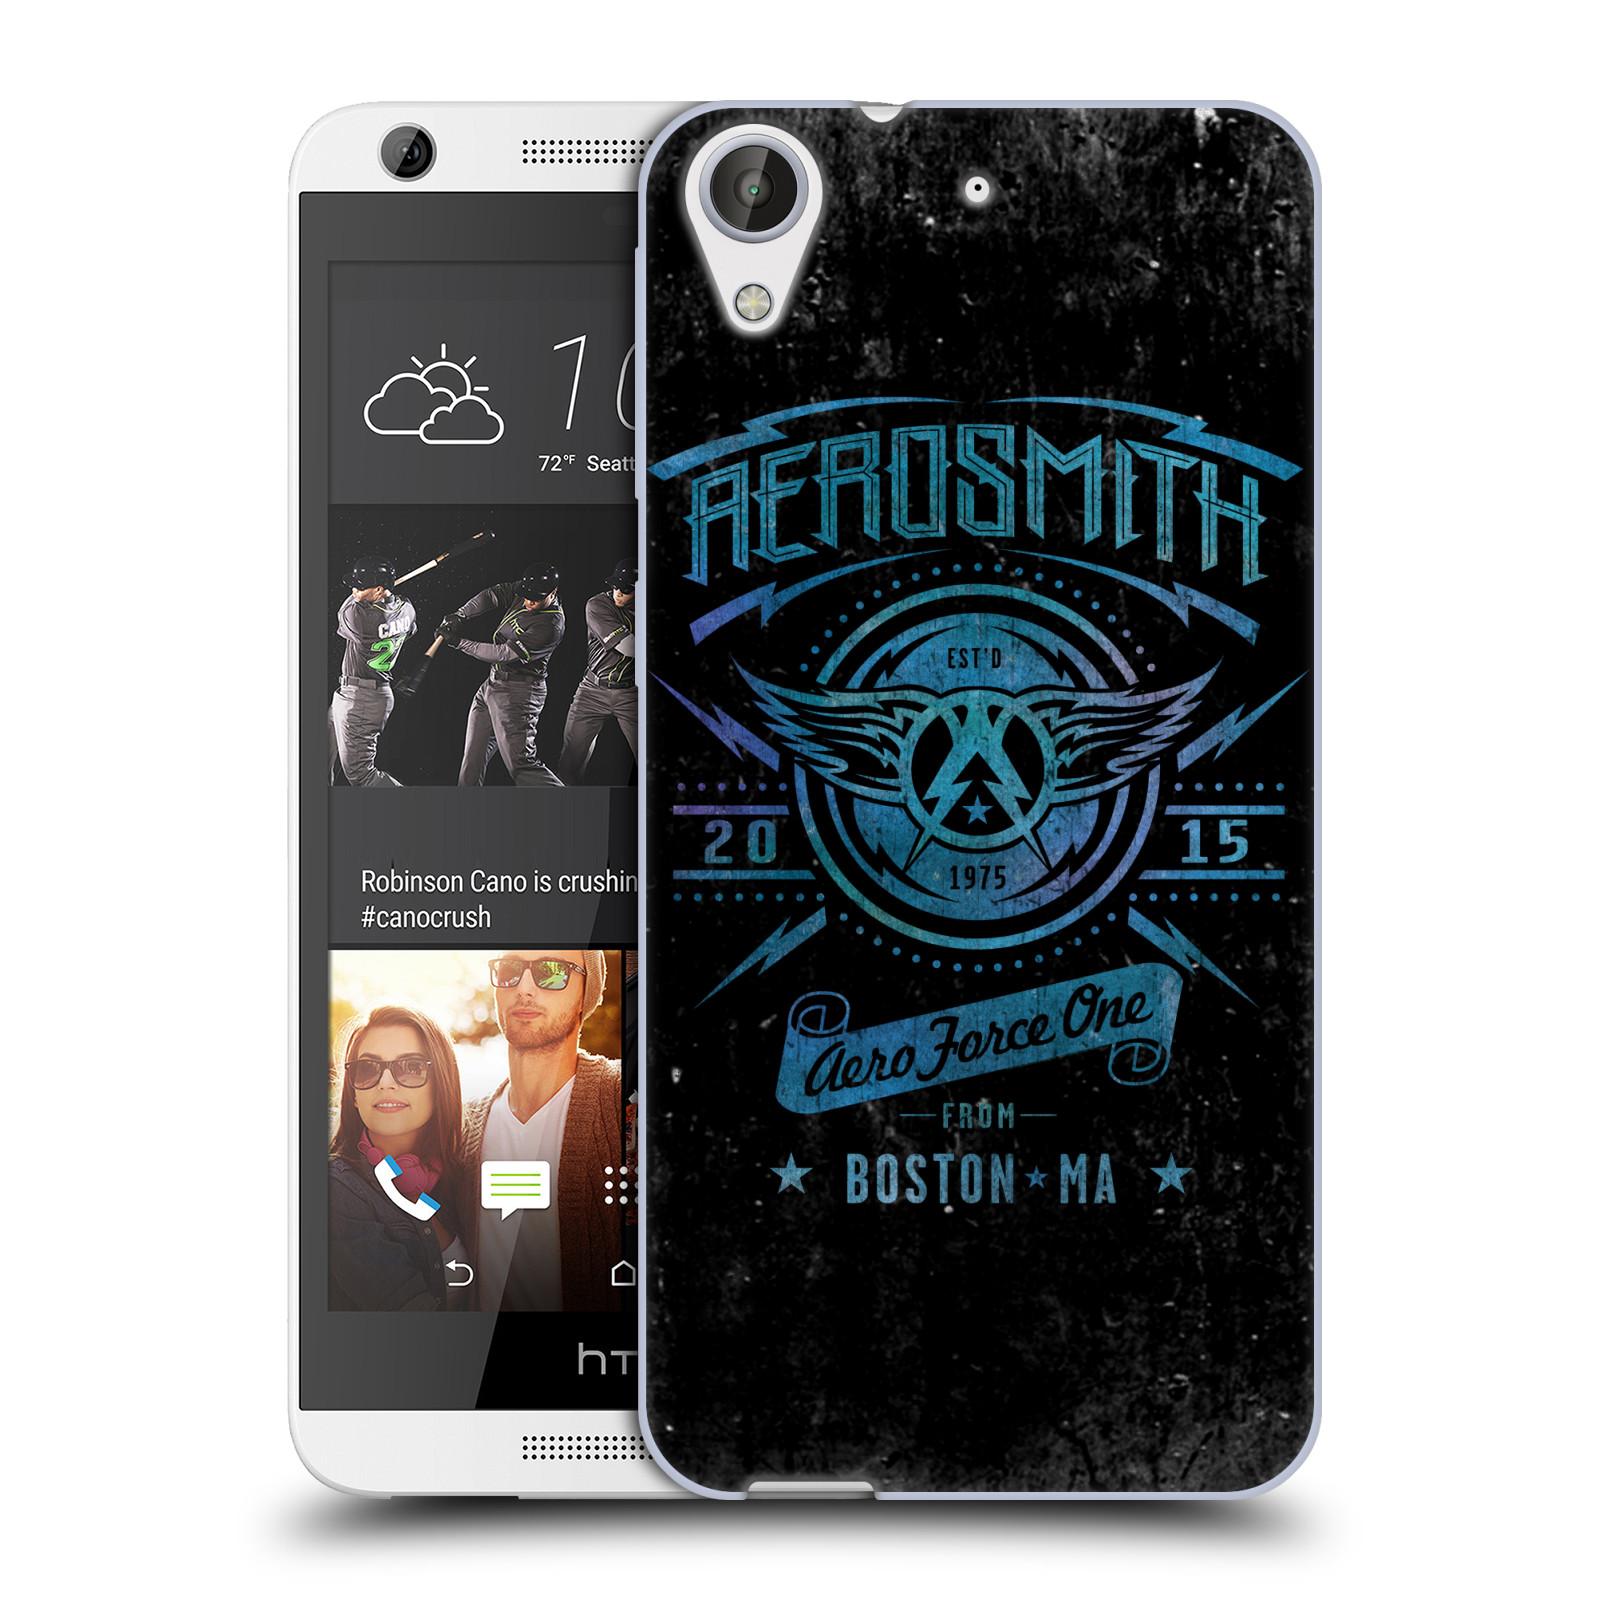 Silikonové pouzdro na mobil HTC Desire 626 / 626G HEAD CASE - Aerosmith - Aero Force One (Silikonový kryt či obal na mobilní telefon s licencovaným motivem Aerosmith pro HTC Desire 626 a 626G Dual SIM)